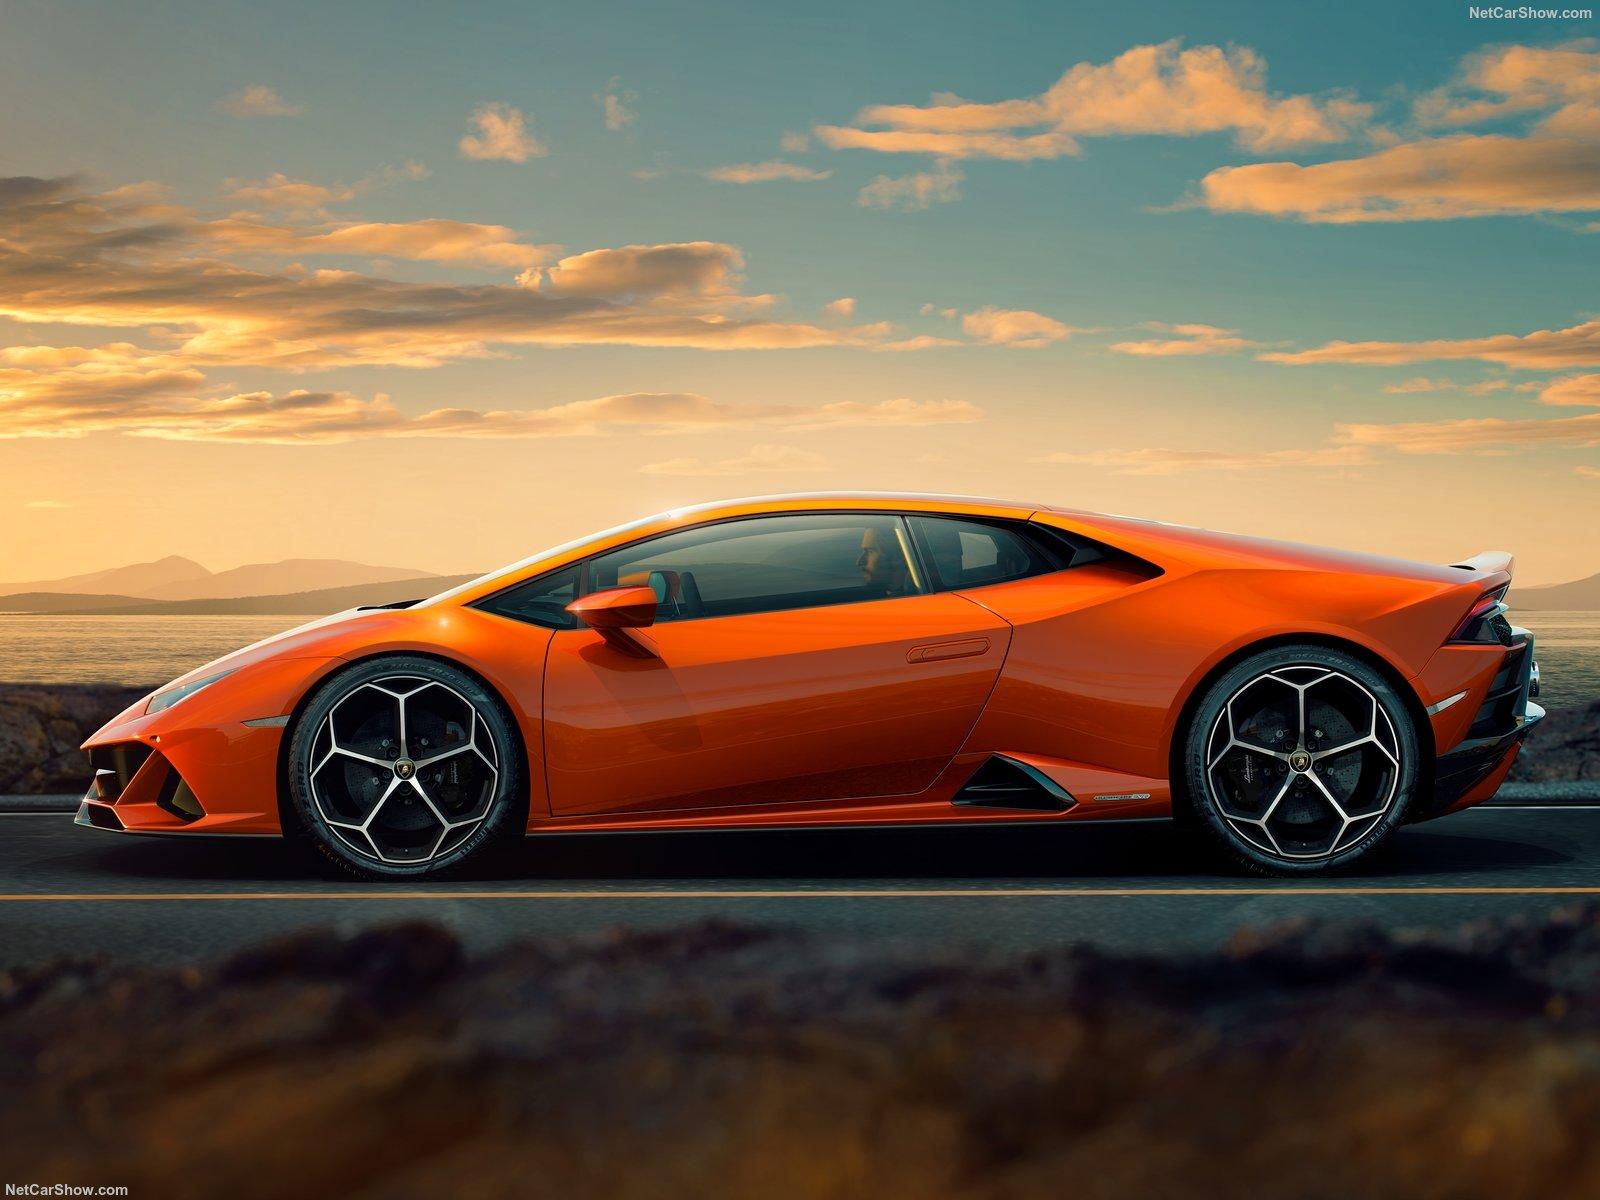 Lamborghini Huracan Evo tem 639 cv de potência